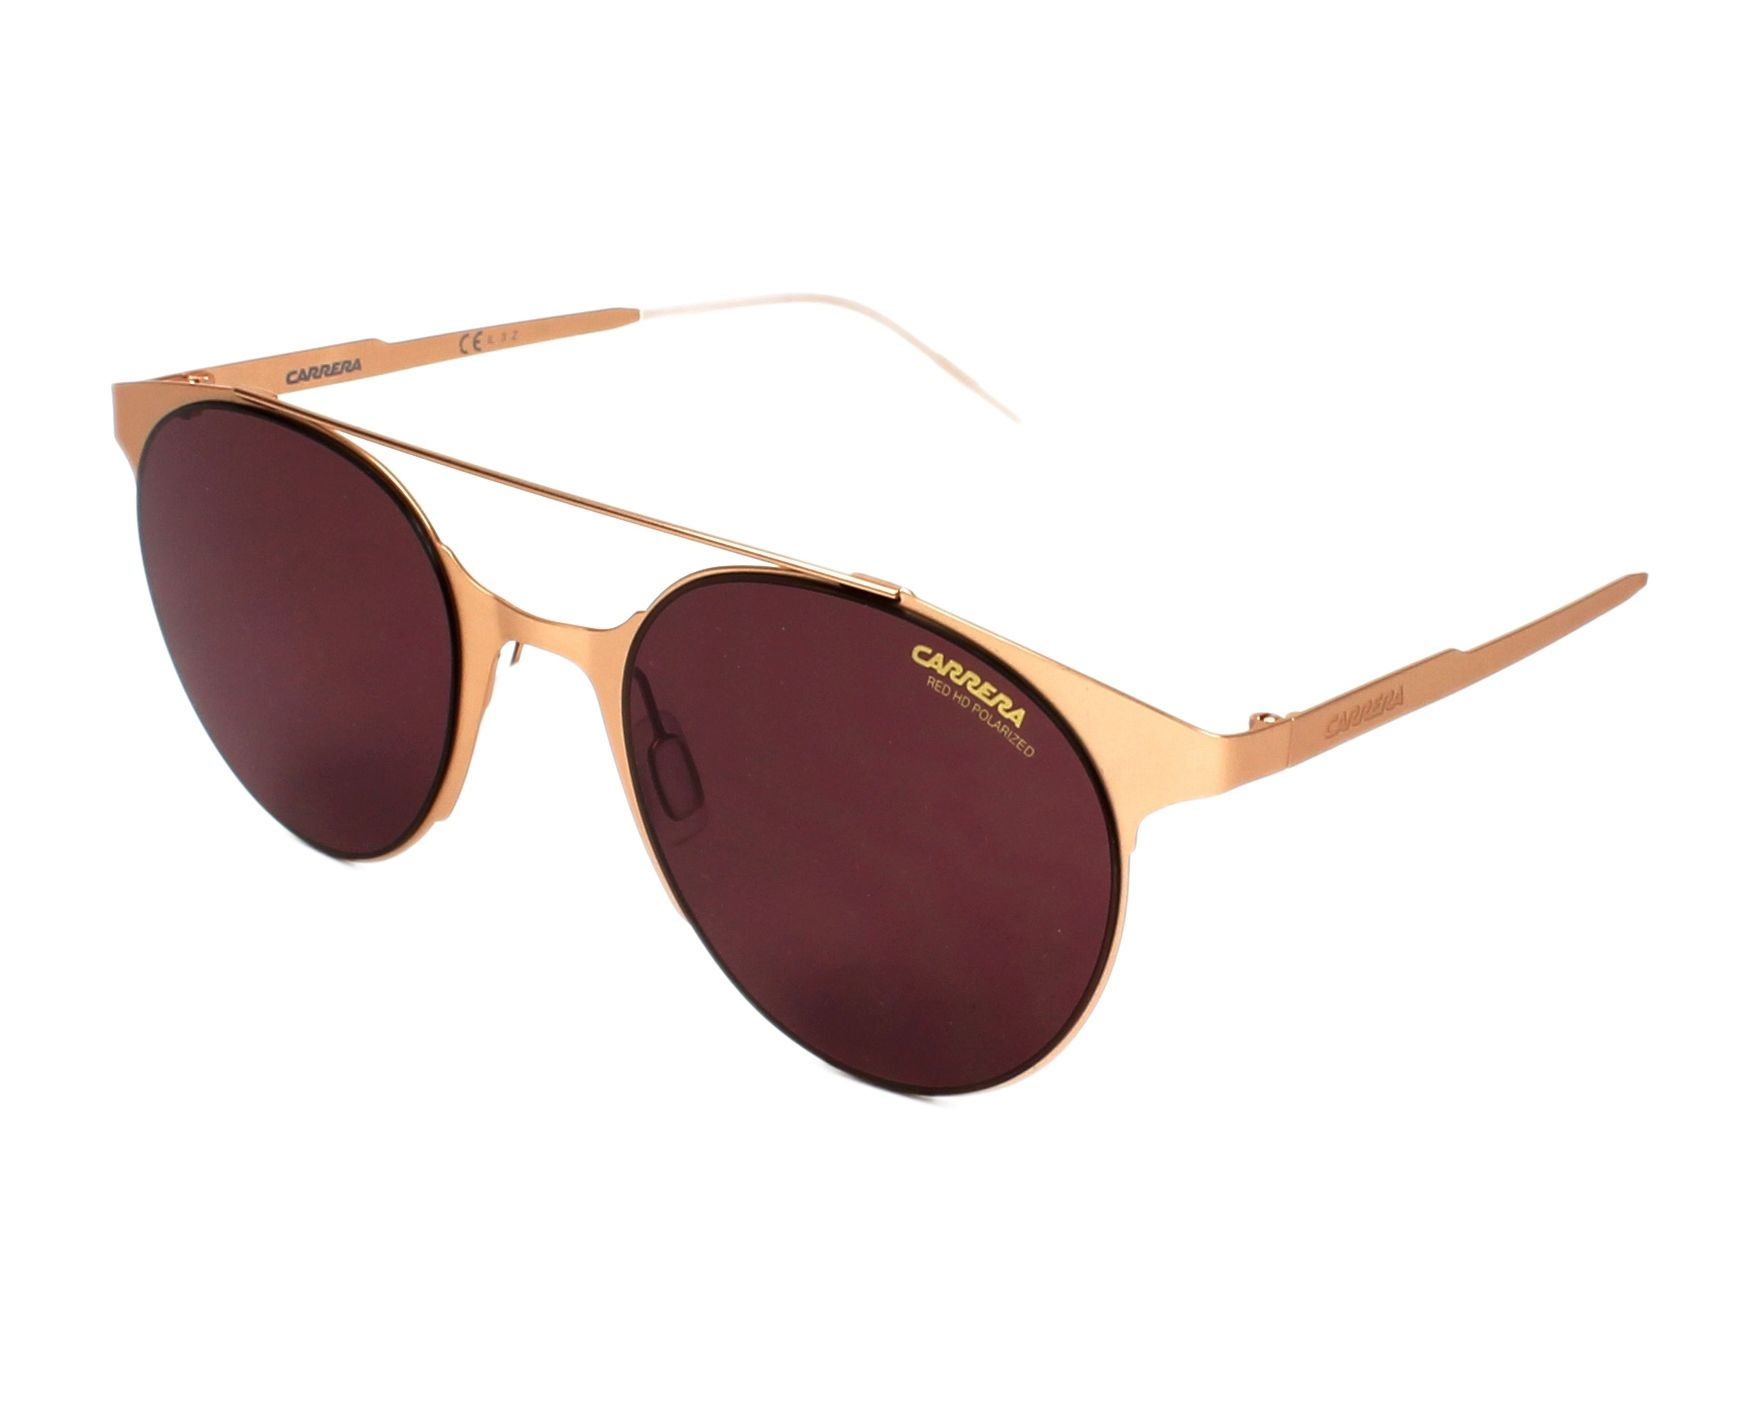 Carrera 115/S Sonnenbrille Kupfergold 03O 50mm O8cxR5